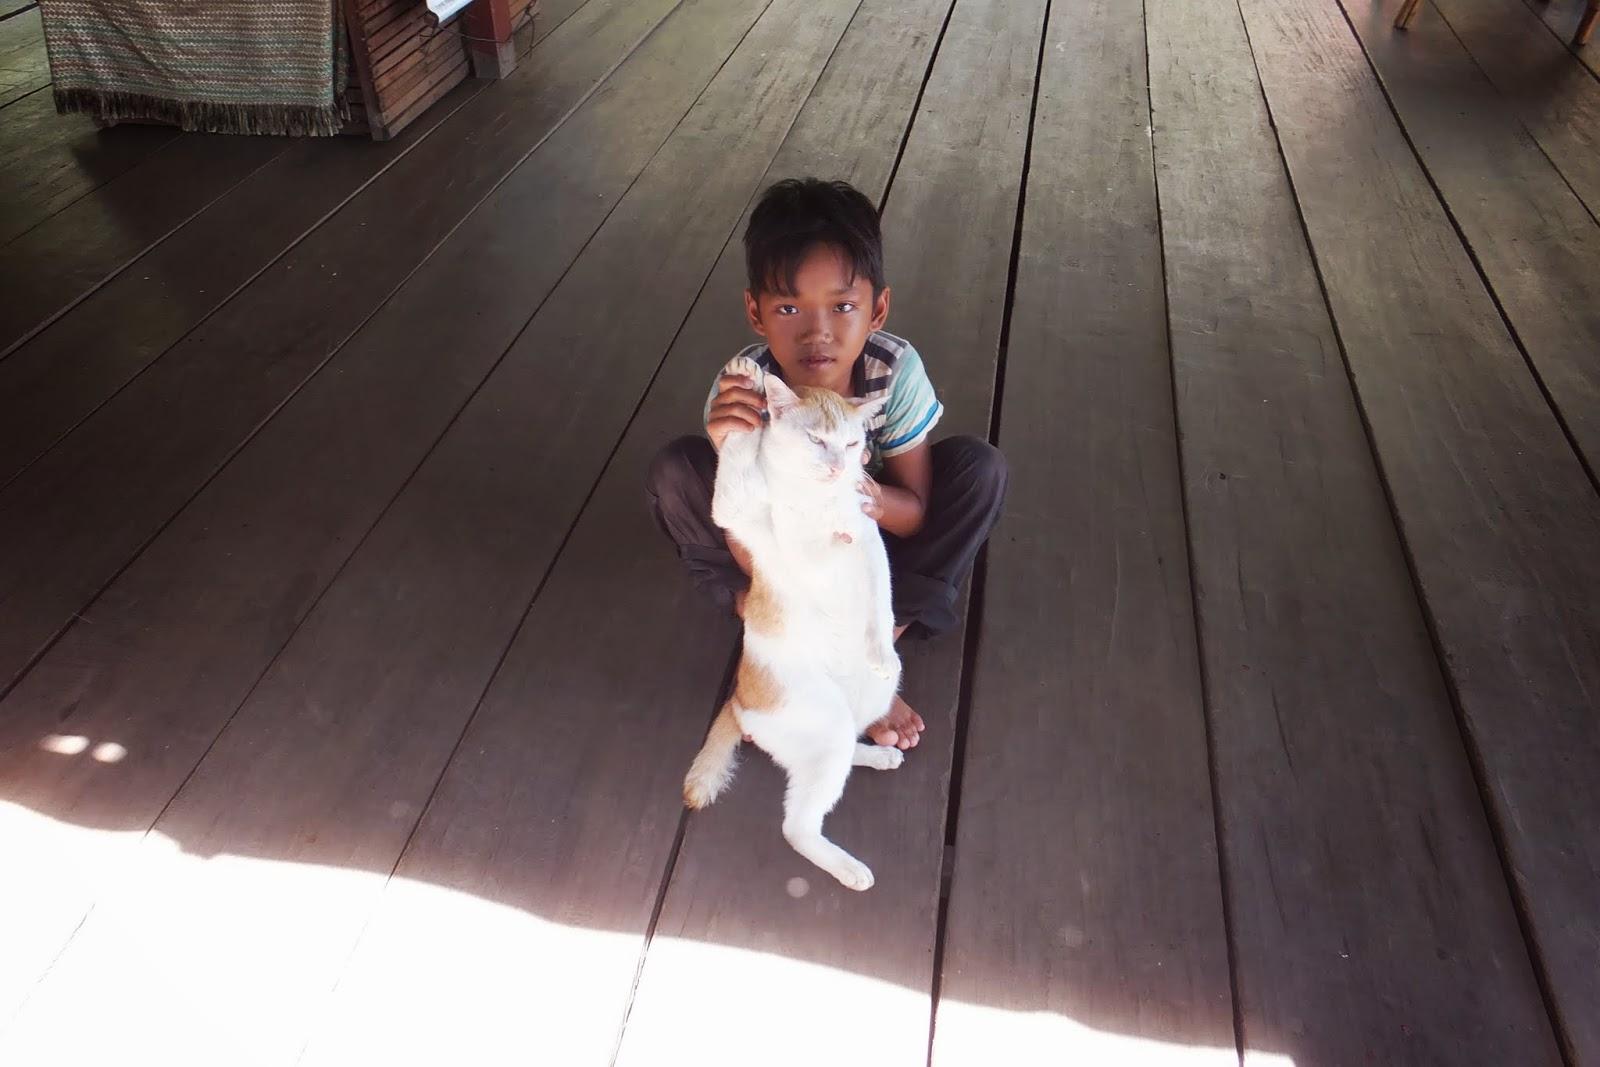 boy-with-cat 猫と遊ぶ少年